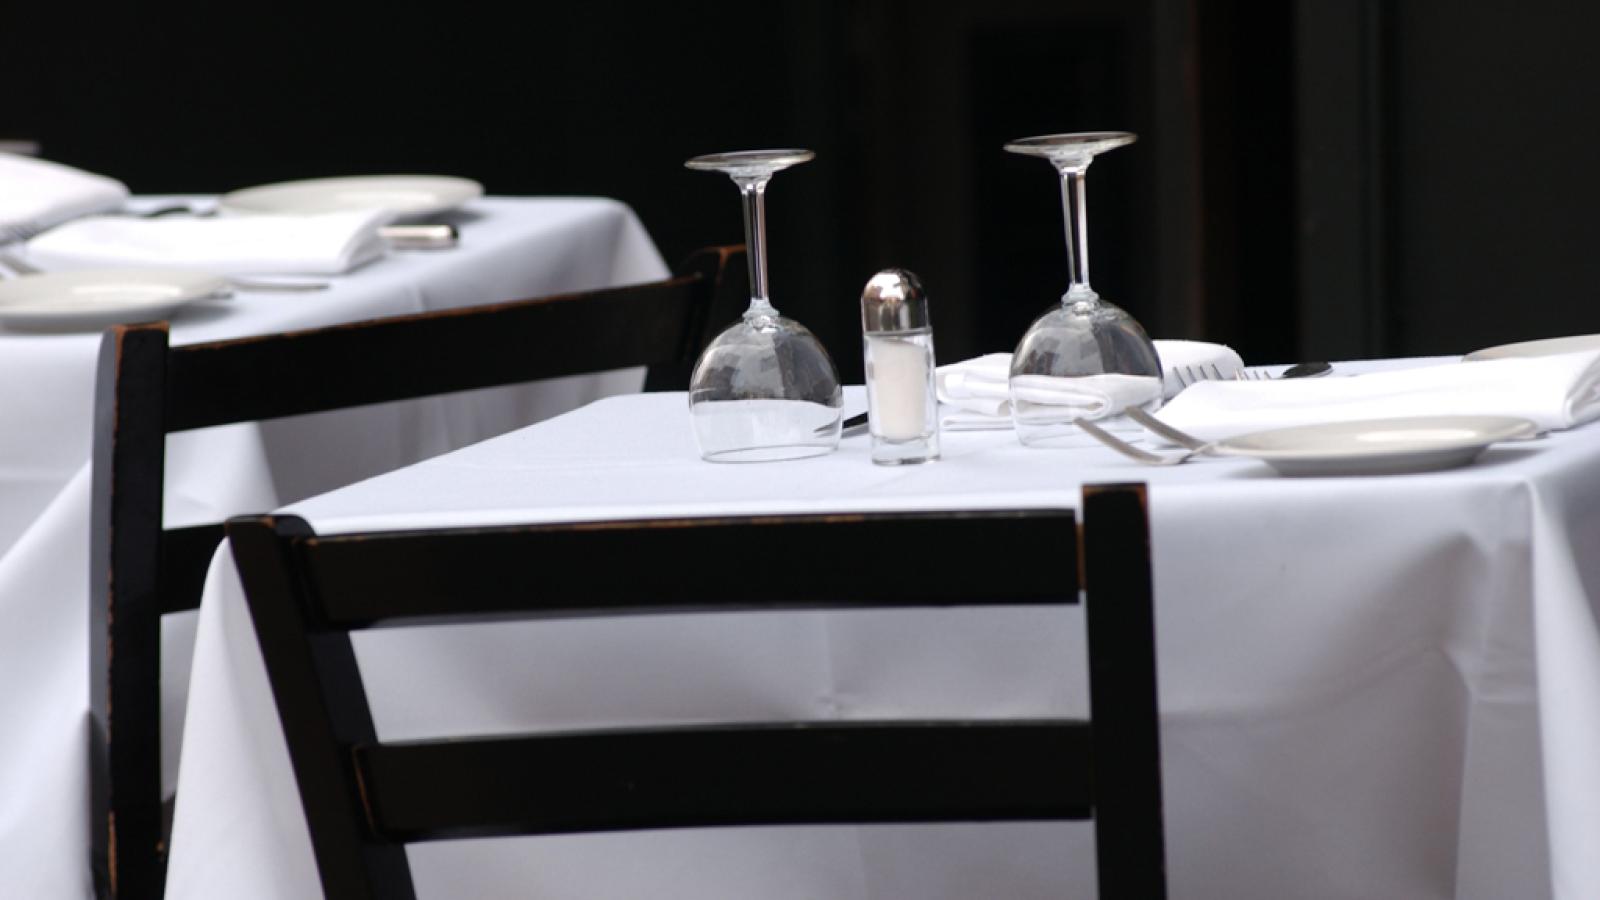 24 horas - Pablo Méndez: '¿Con qué político te irías a cenar esta noche?' - 06/01/16 - Escuchar ahora